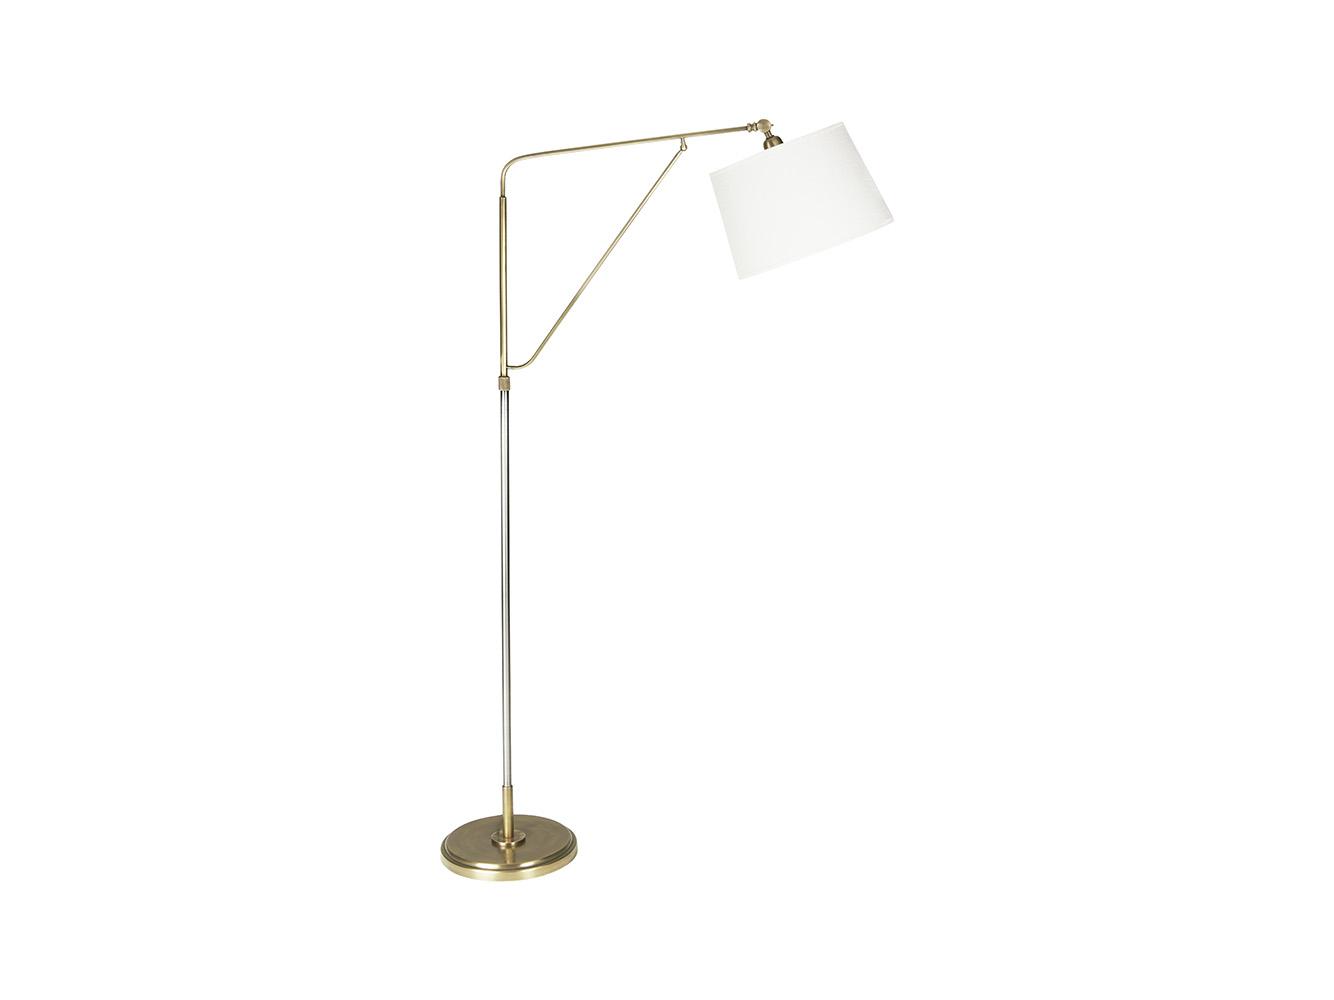 Yard Arm Floor Lamp With Natural Hessian Shade